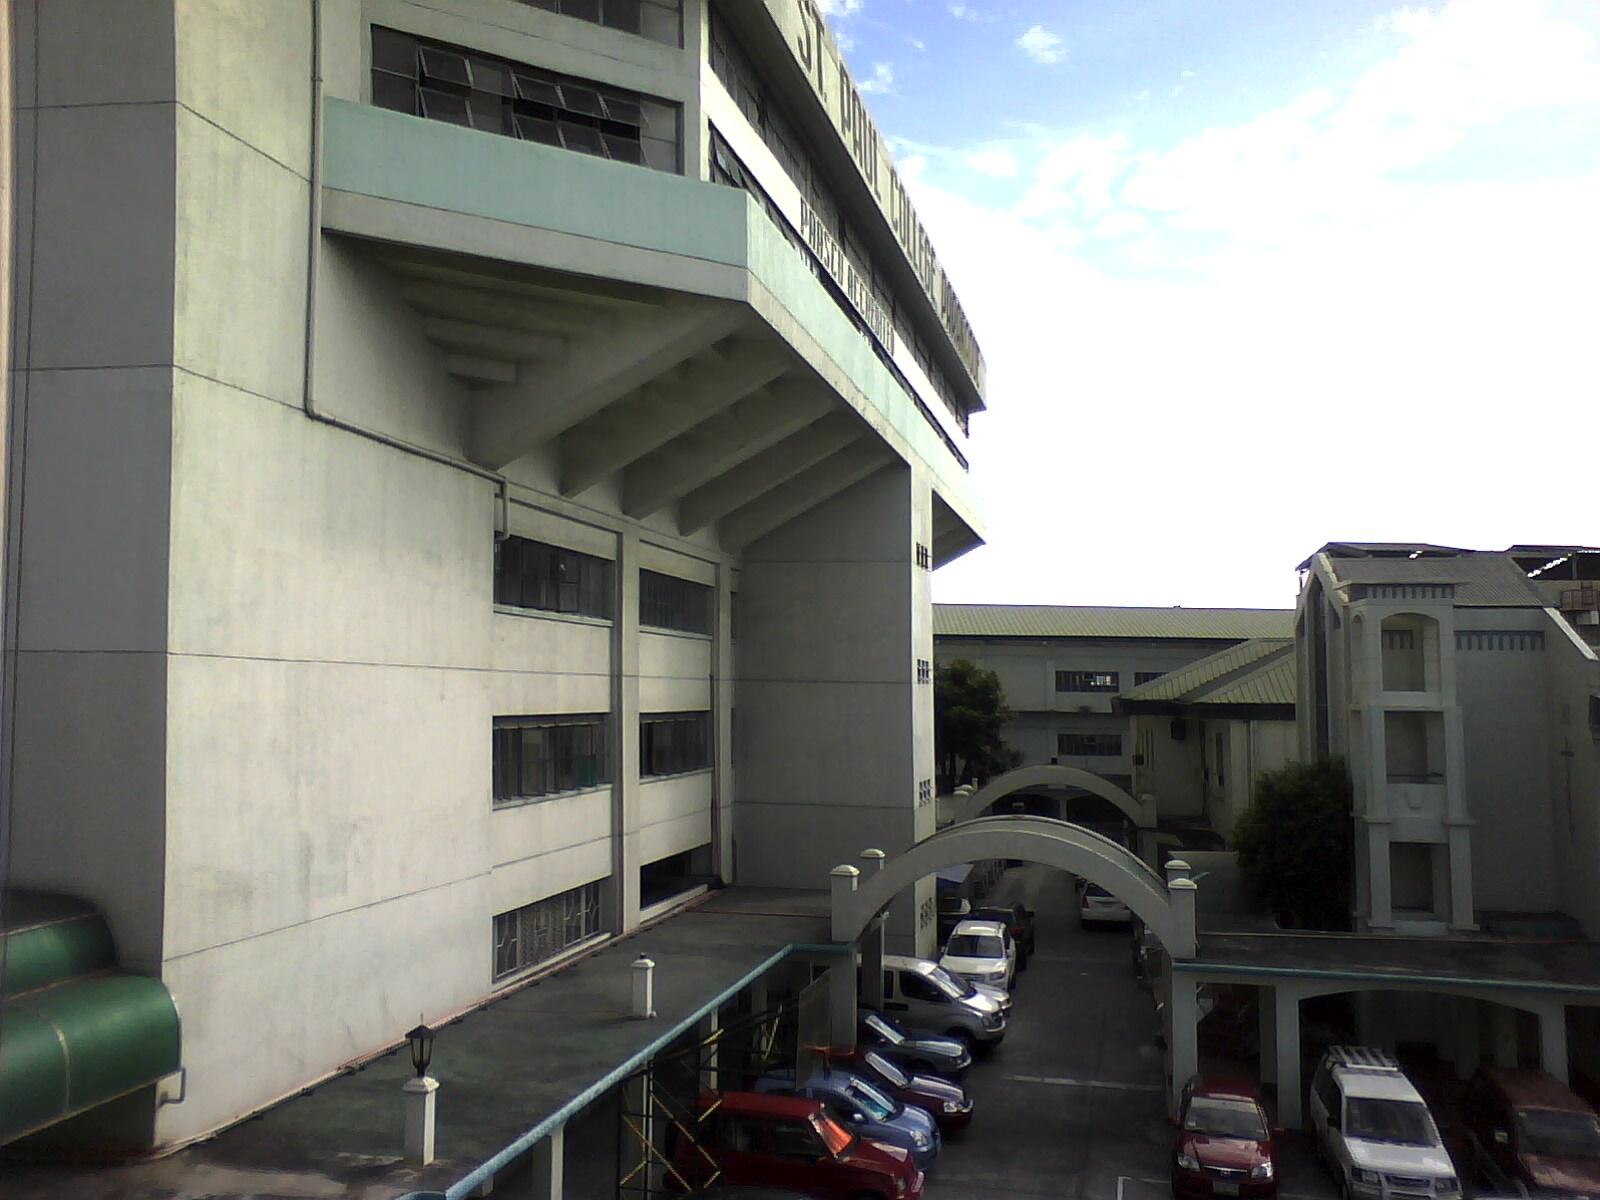 File:SPCP Third Floor View